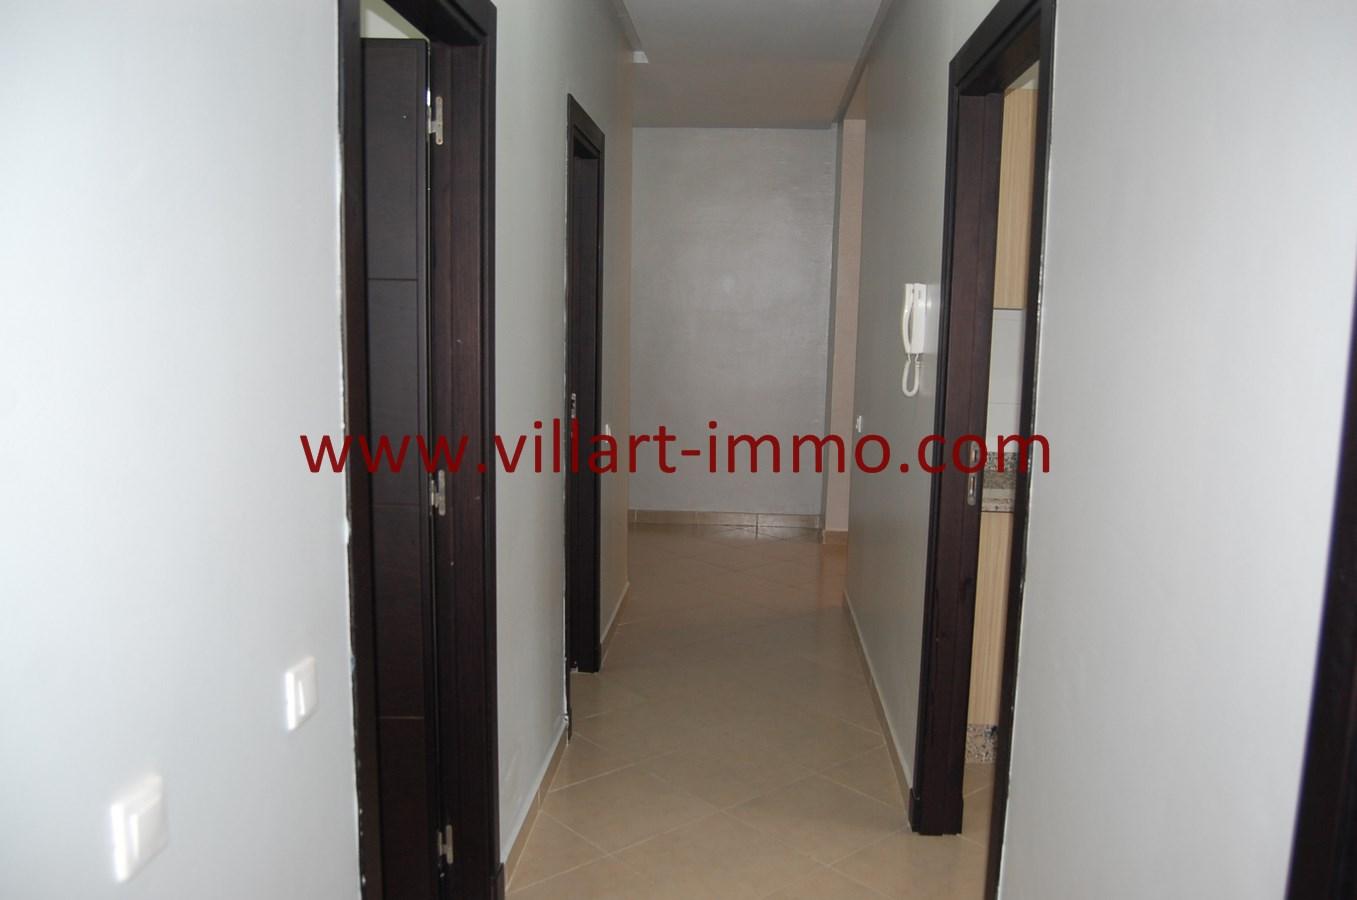 5-Vente-Appartement-Tanger-Route-de-Rabat-Couloir-VA474-Villart Immo